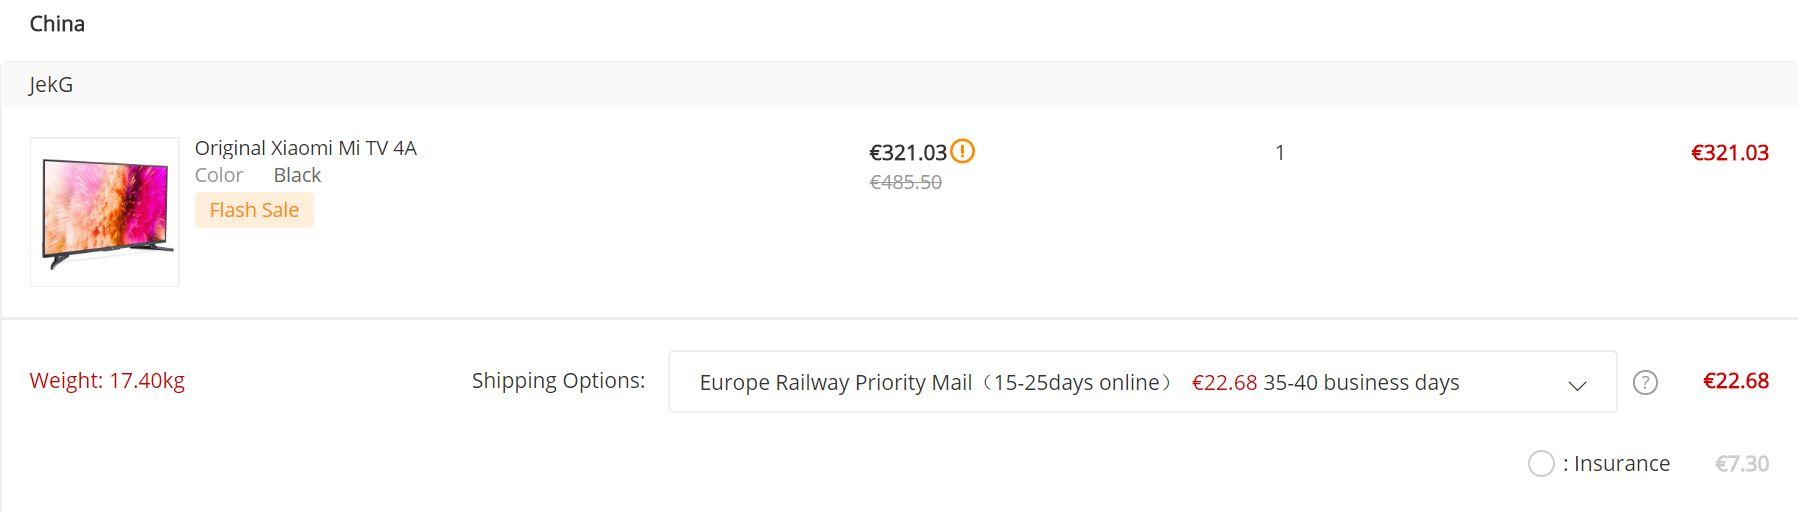 Gearbest Europe Railway Priority Mail